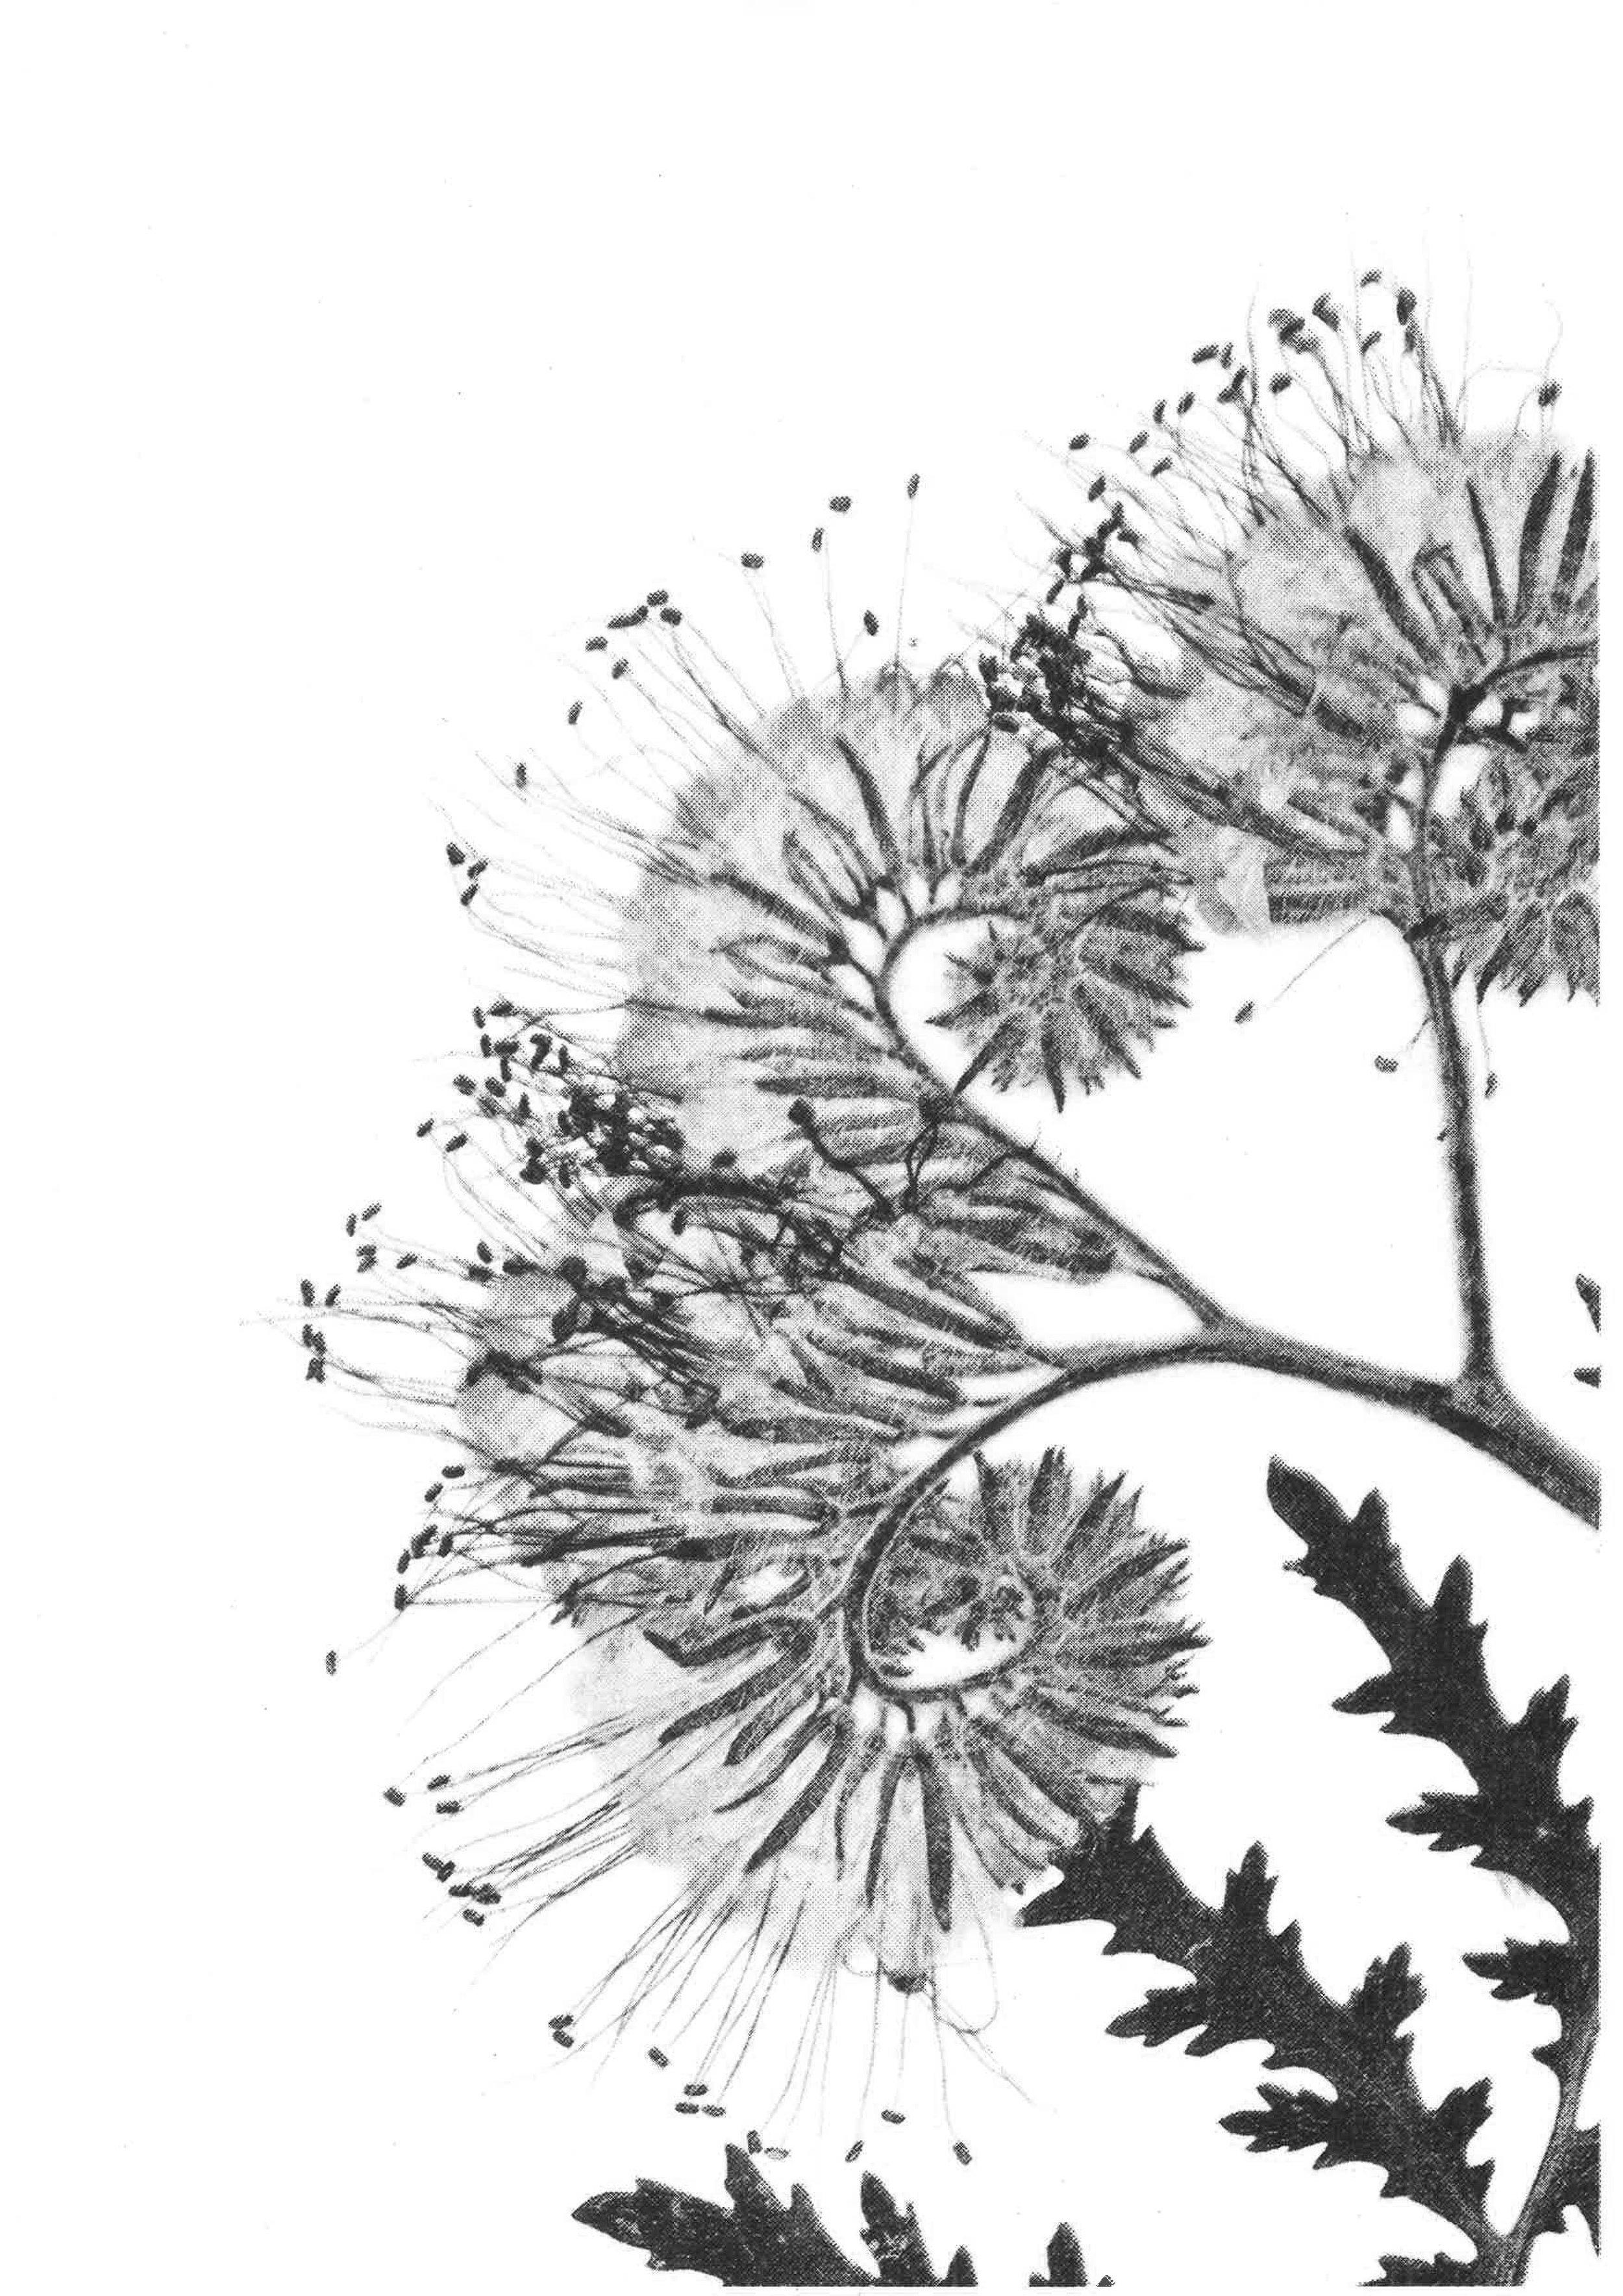 Flower-scan_bw9.jpg